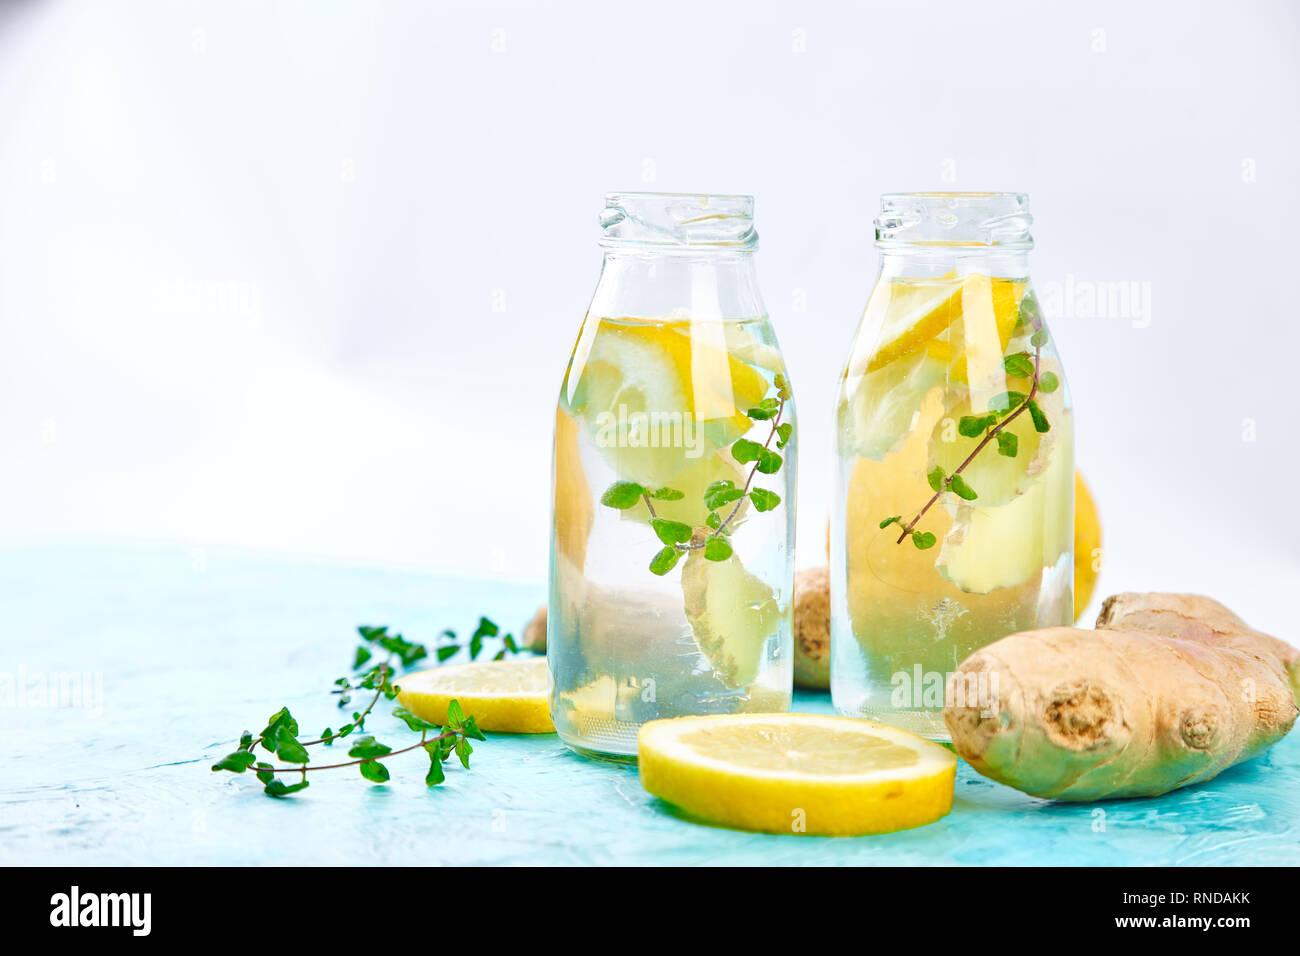 Trendy Detox Healthy Drink Detox Water In Bottles With